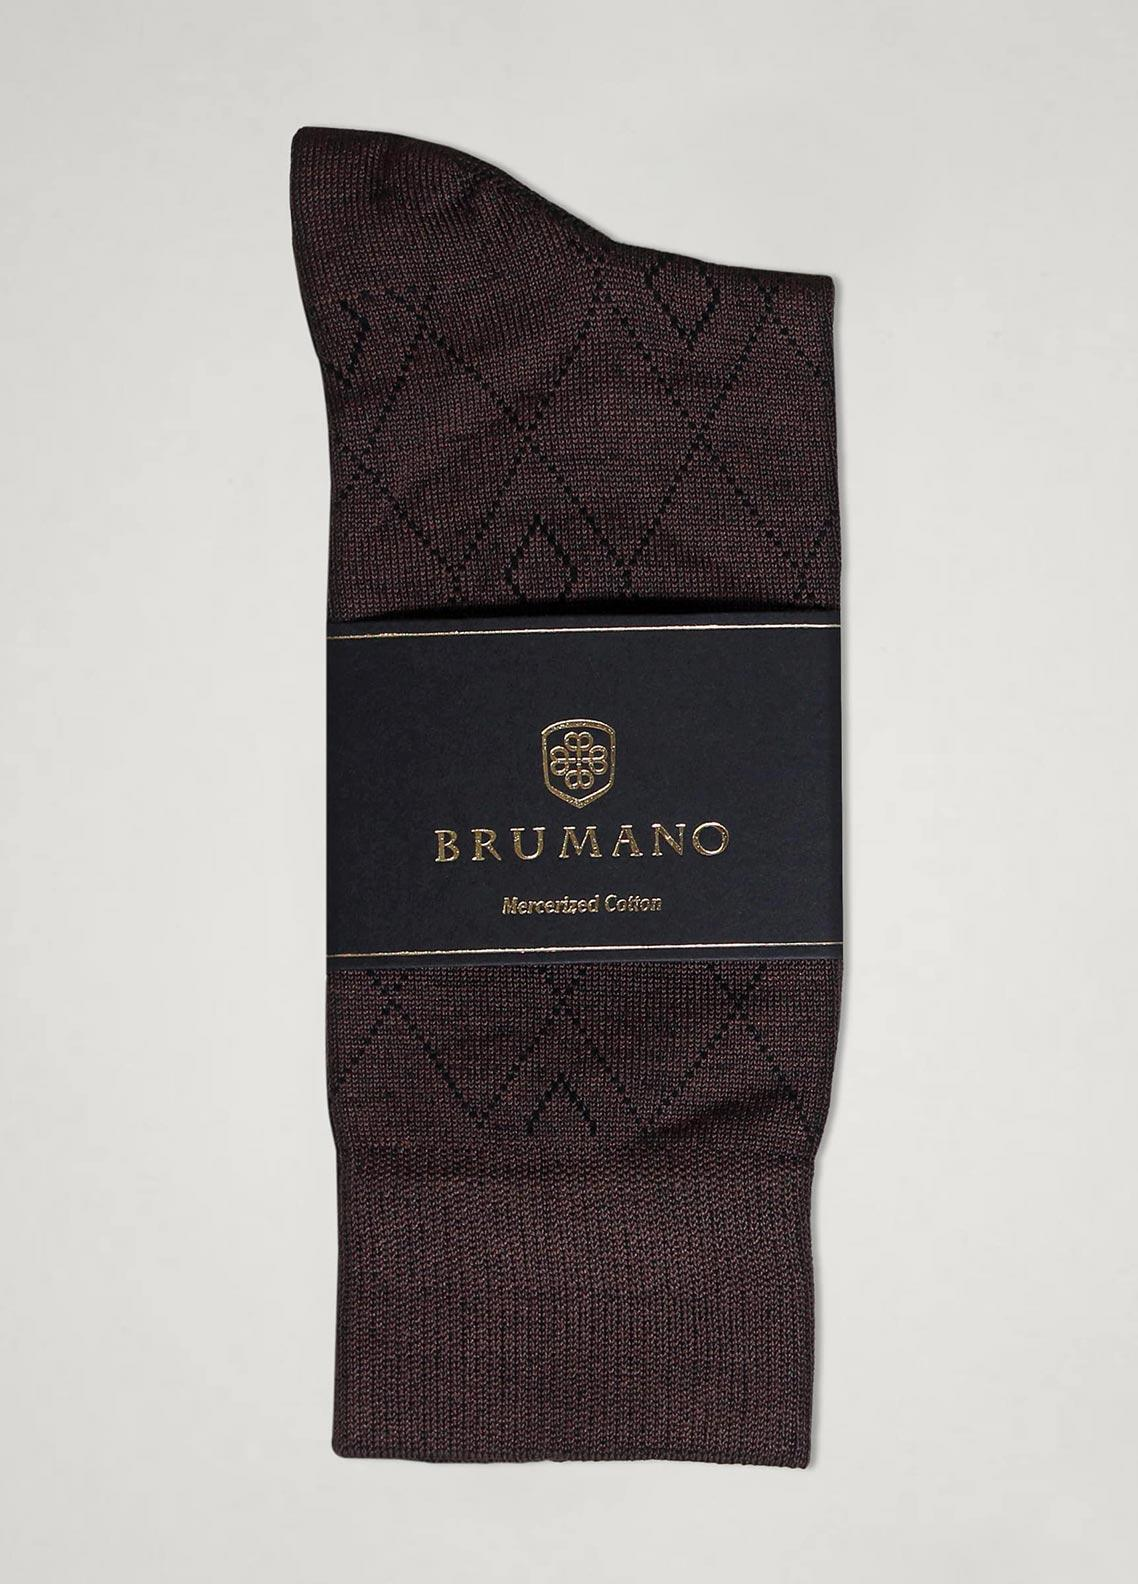 Brumano Cotton Socks SKS-020